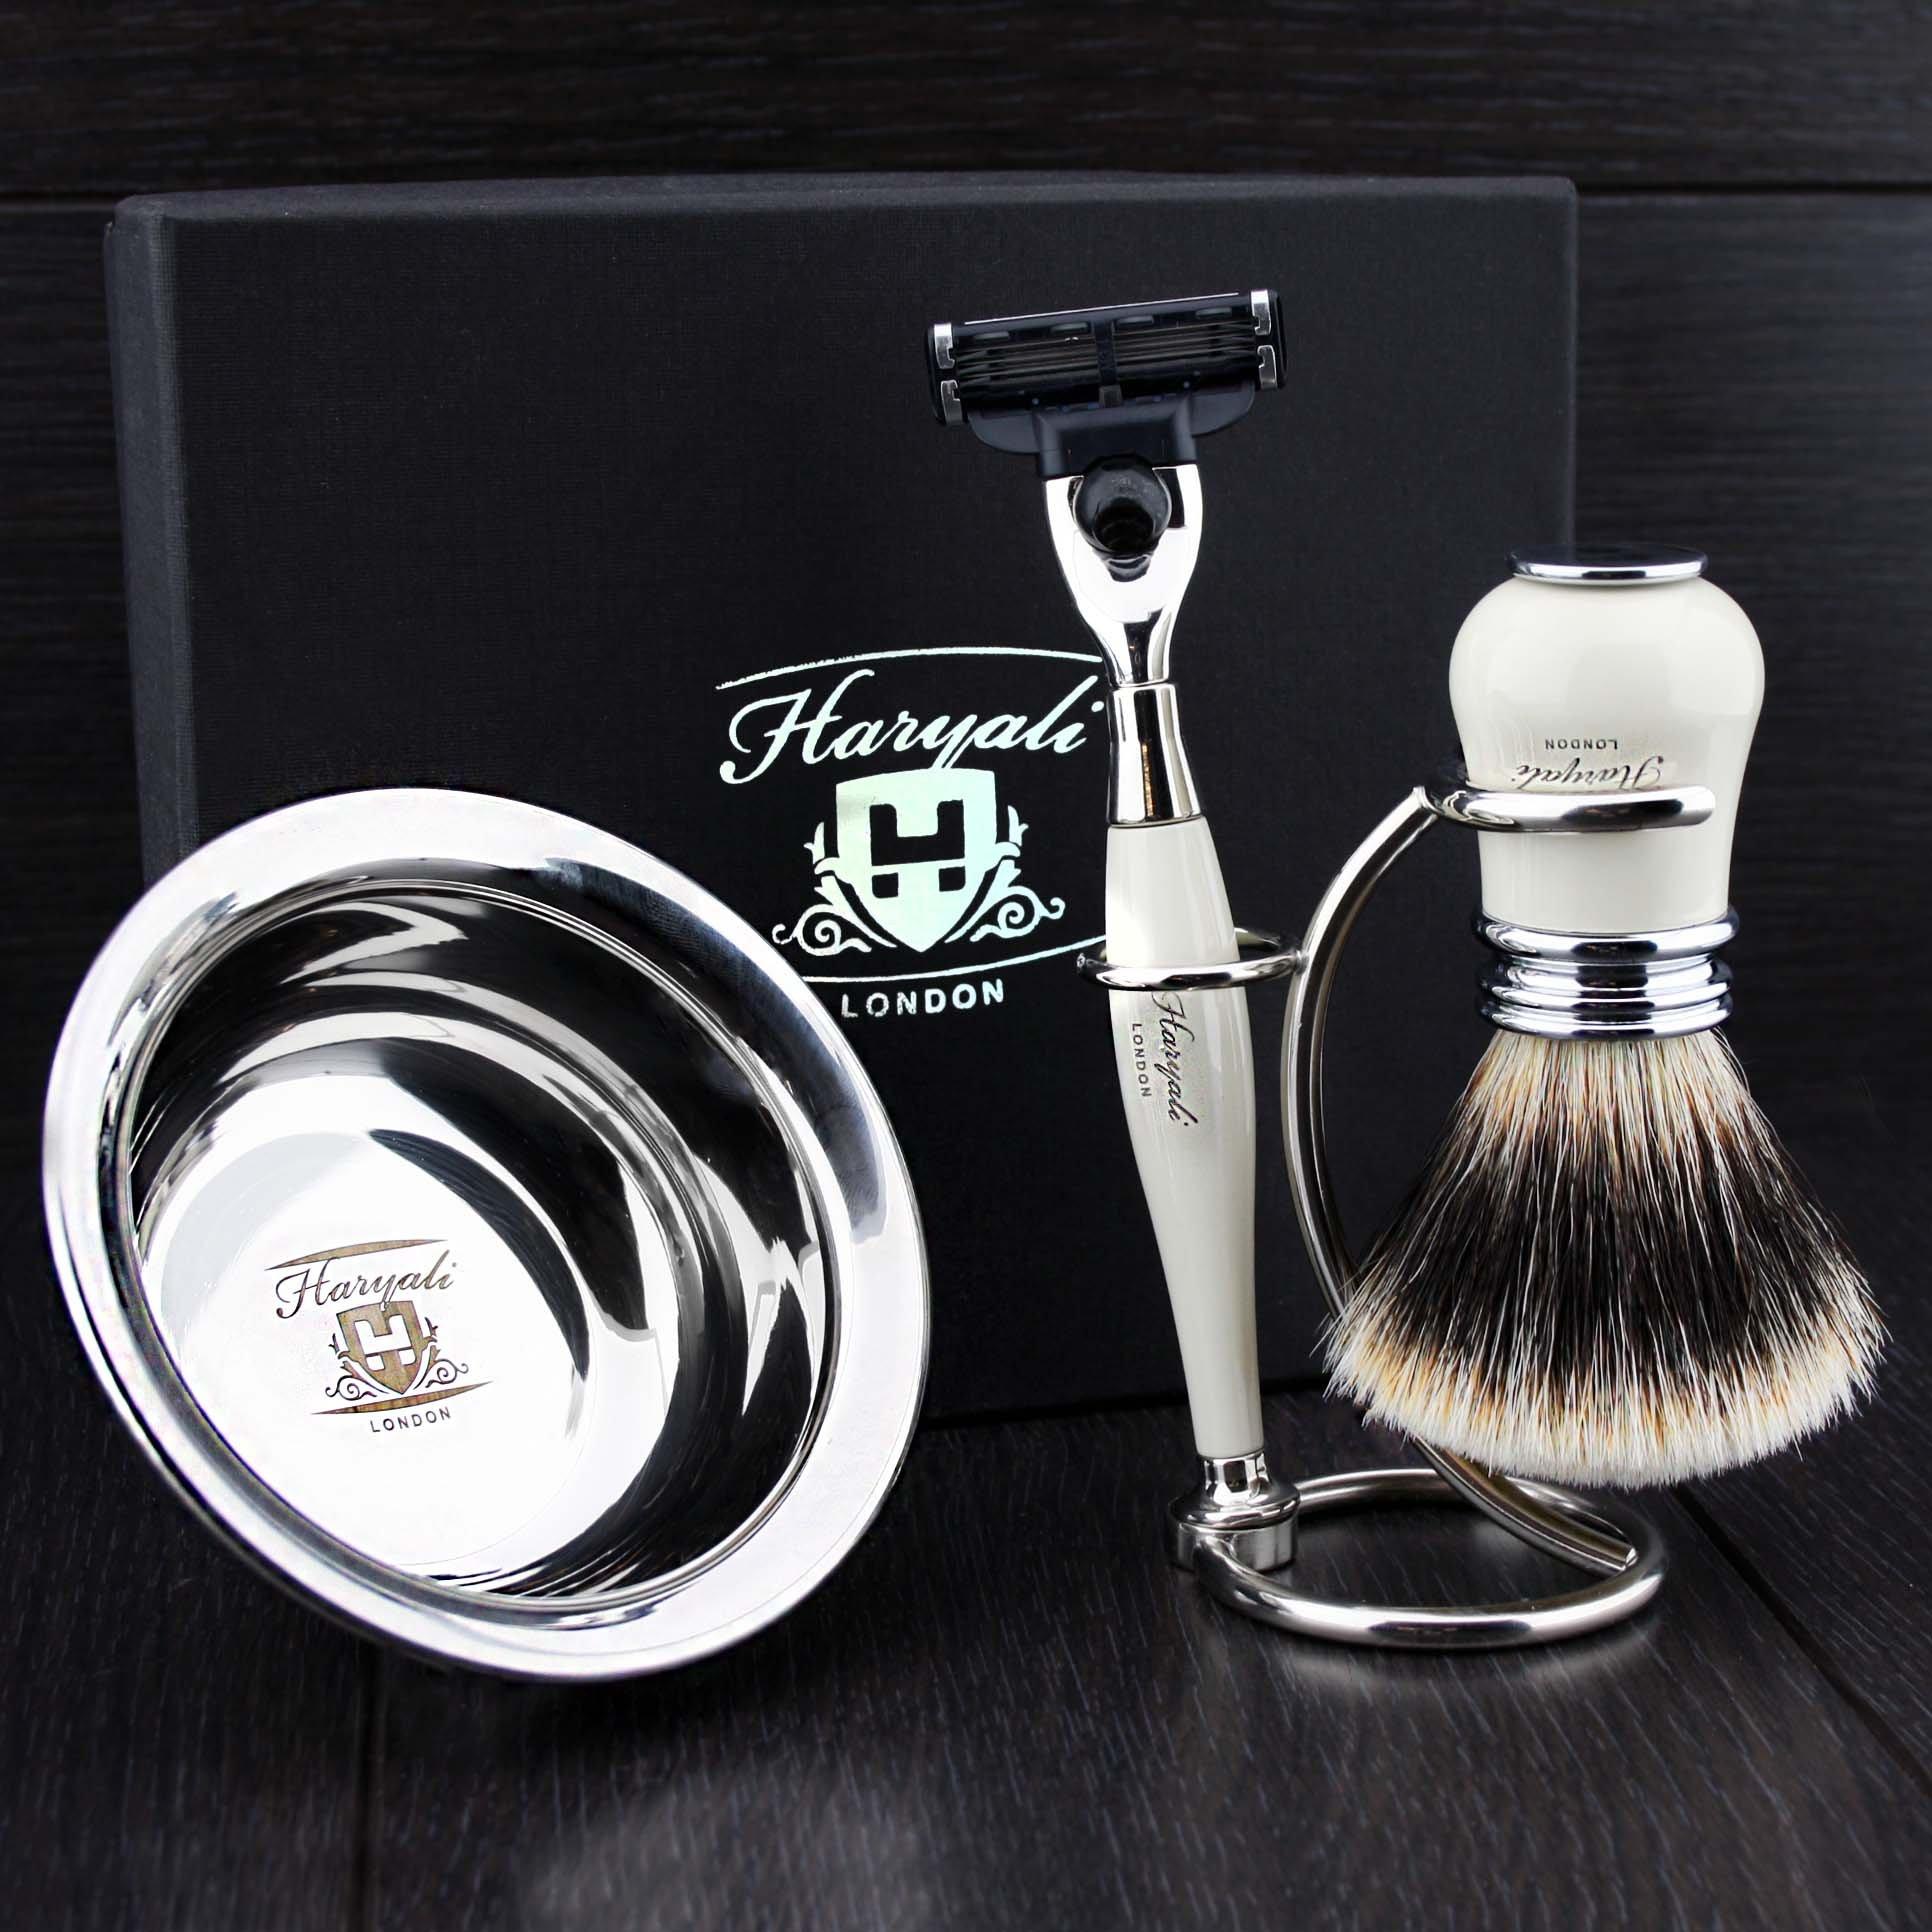 4 Pcs Men's Shaving Set In Ivory Colour ft Gillette Mach 3 Razor(Replaceable Head) ,Sliver Tip Badger Hair Brush, Dual Stand for Both Razor&Brush,Stainless Steel Bowl .New.Perfect Gift Kit for Him